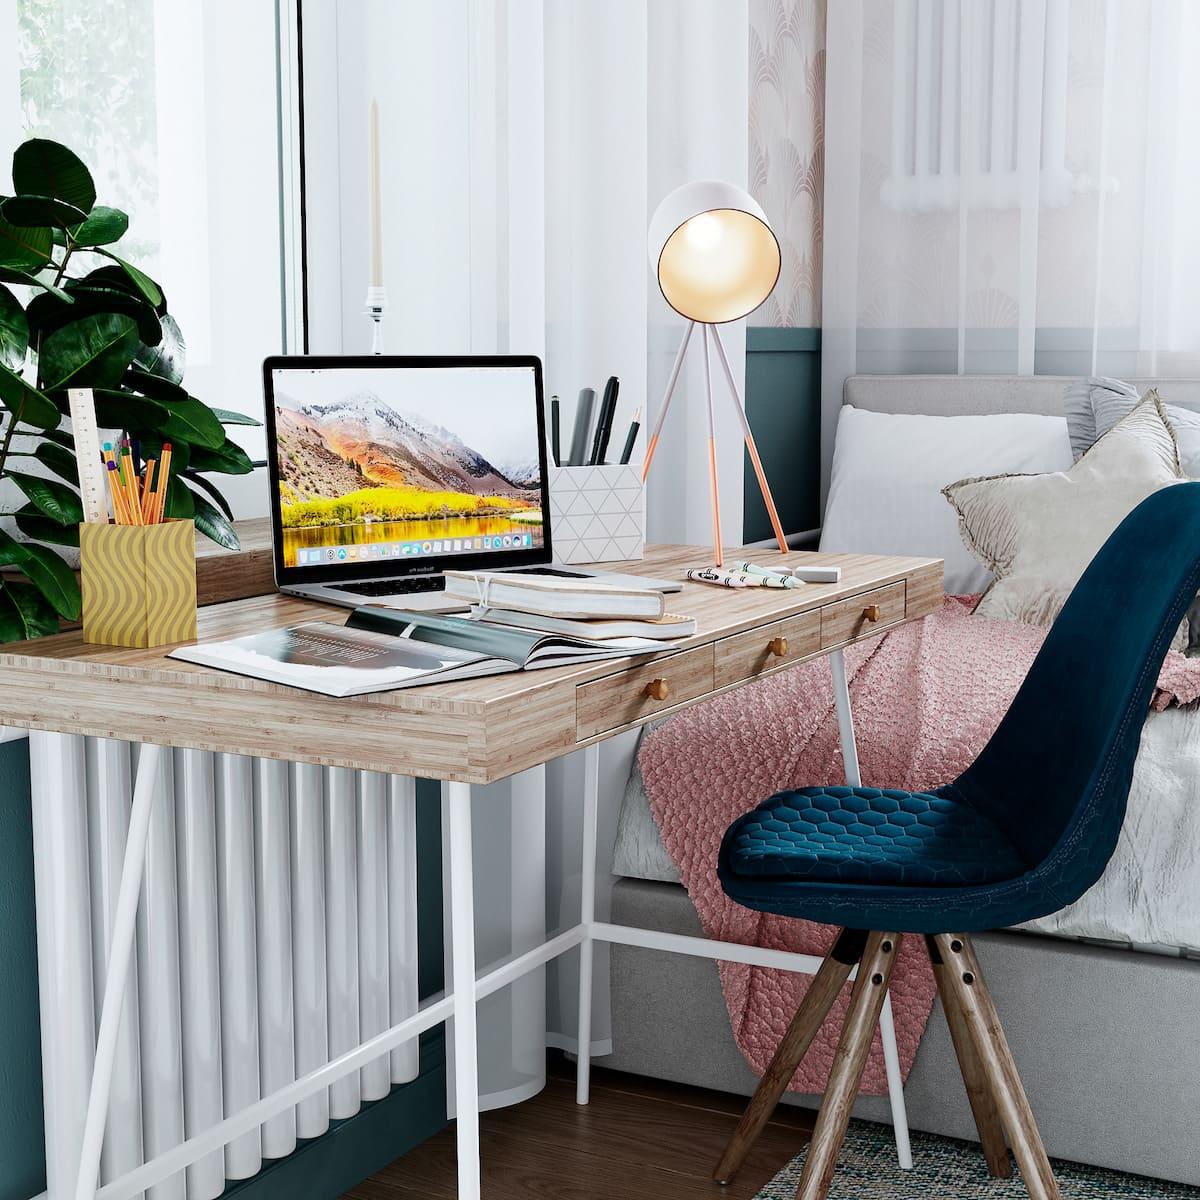 модный дизайн интерьера квартиры фото 69